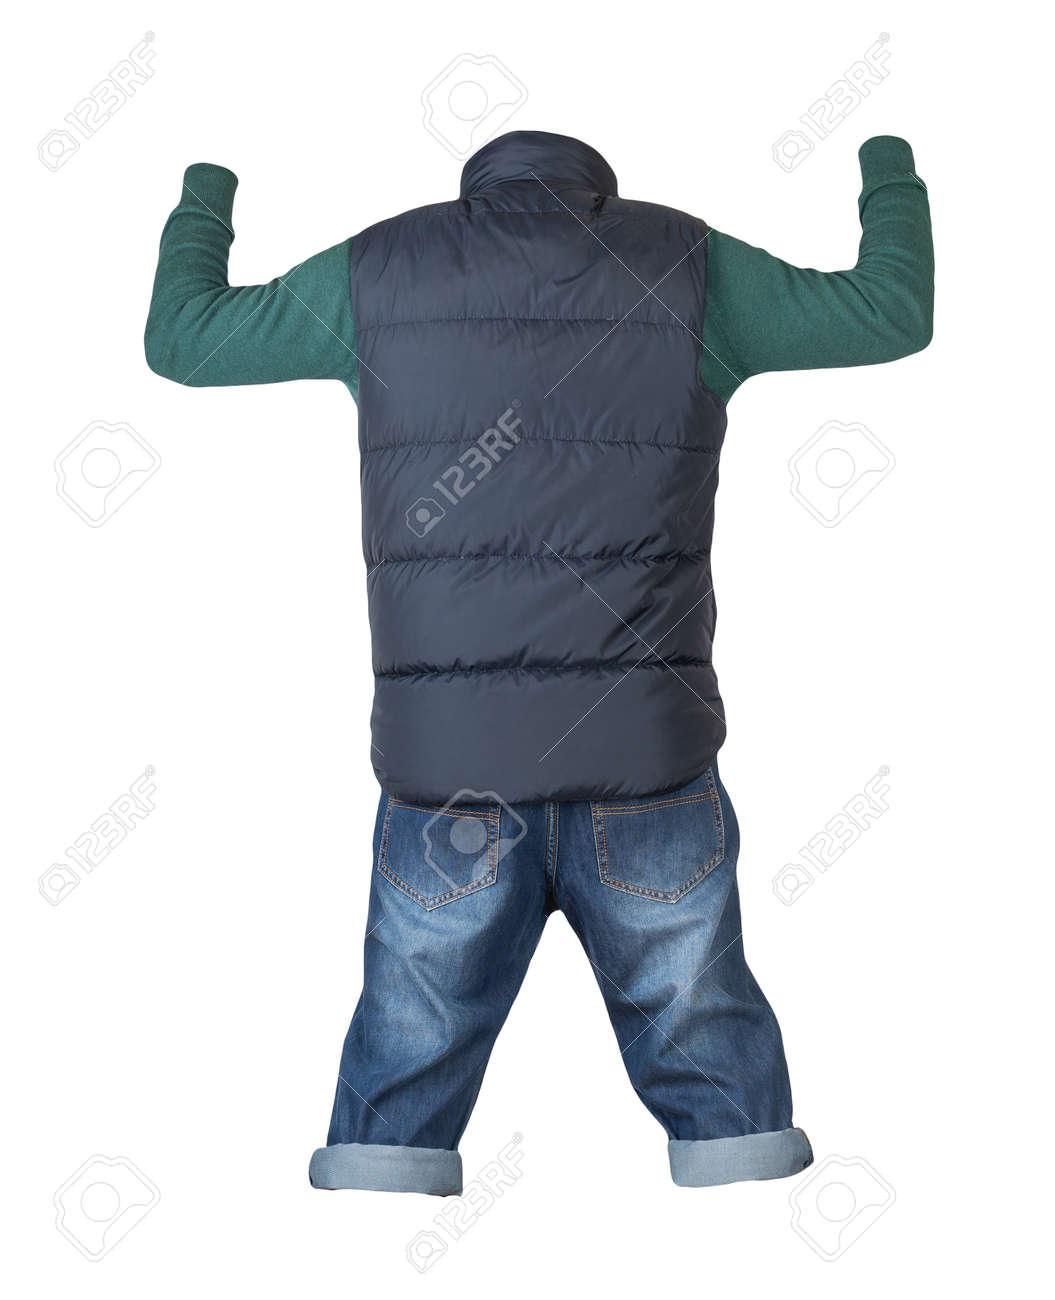 denim dark blue shorts, green knitted sweater and dark blue sleeveless jacket isolated on white background - 172115047